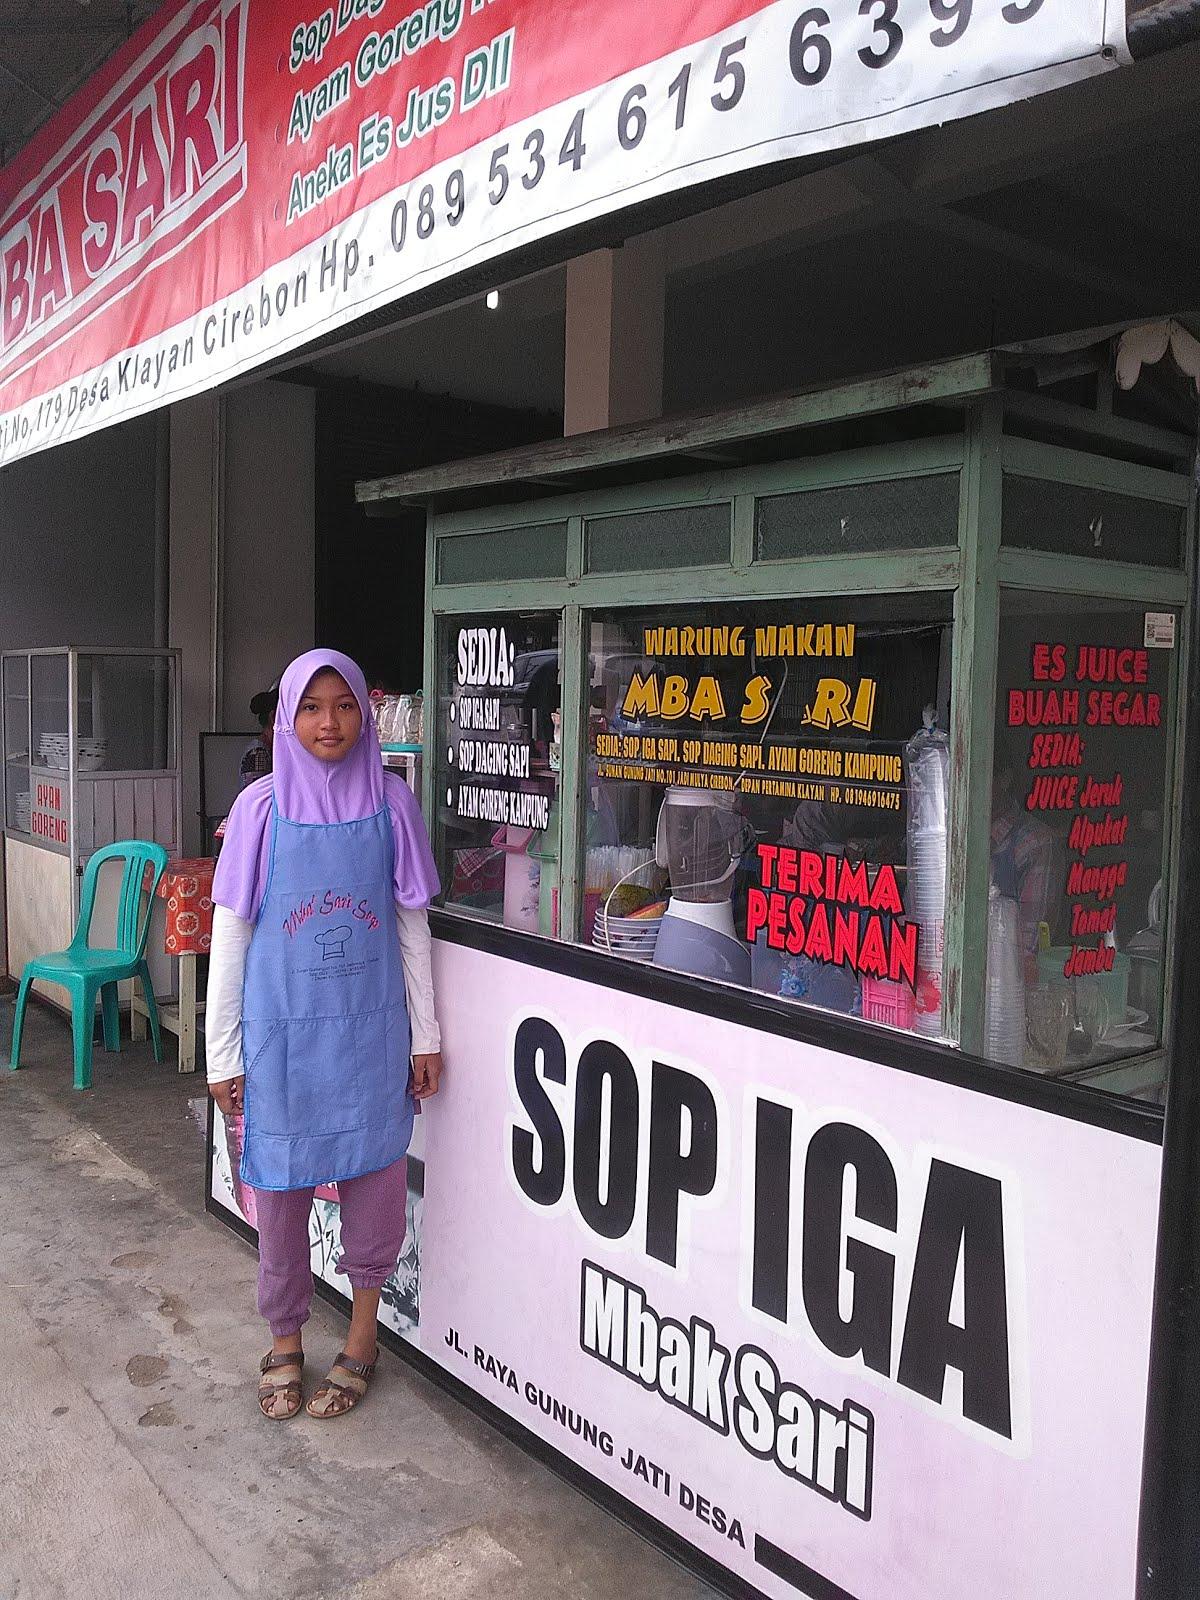 Sop Iga Sapi Cirebon Mbak Sari